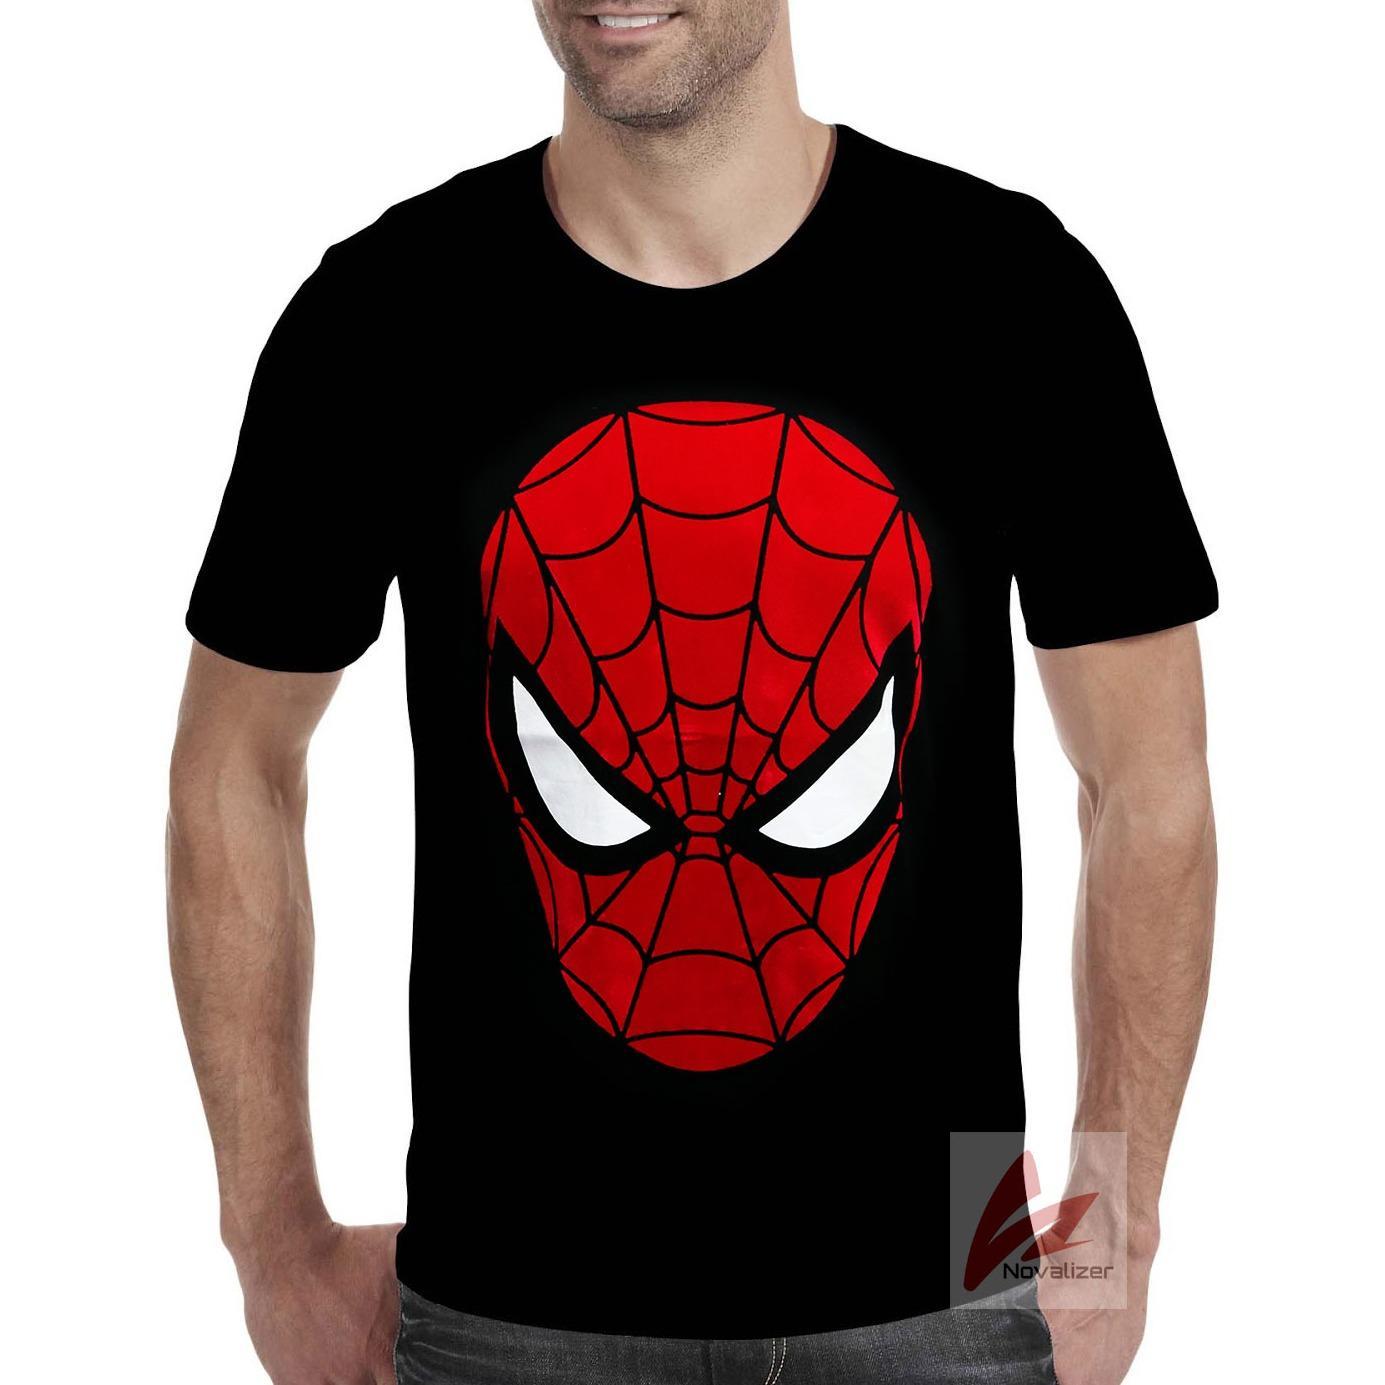 Novalizer - Kaos Distro Spiderman Keren Fashion Pria Wanita Flocking Bludru Timbul Spandek - Hitam